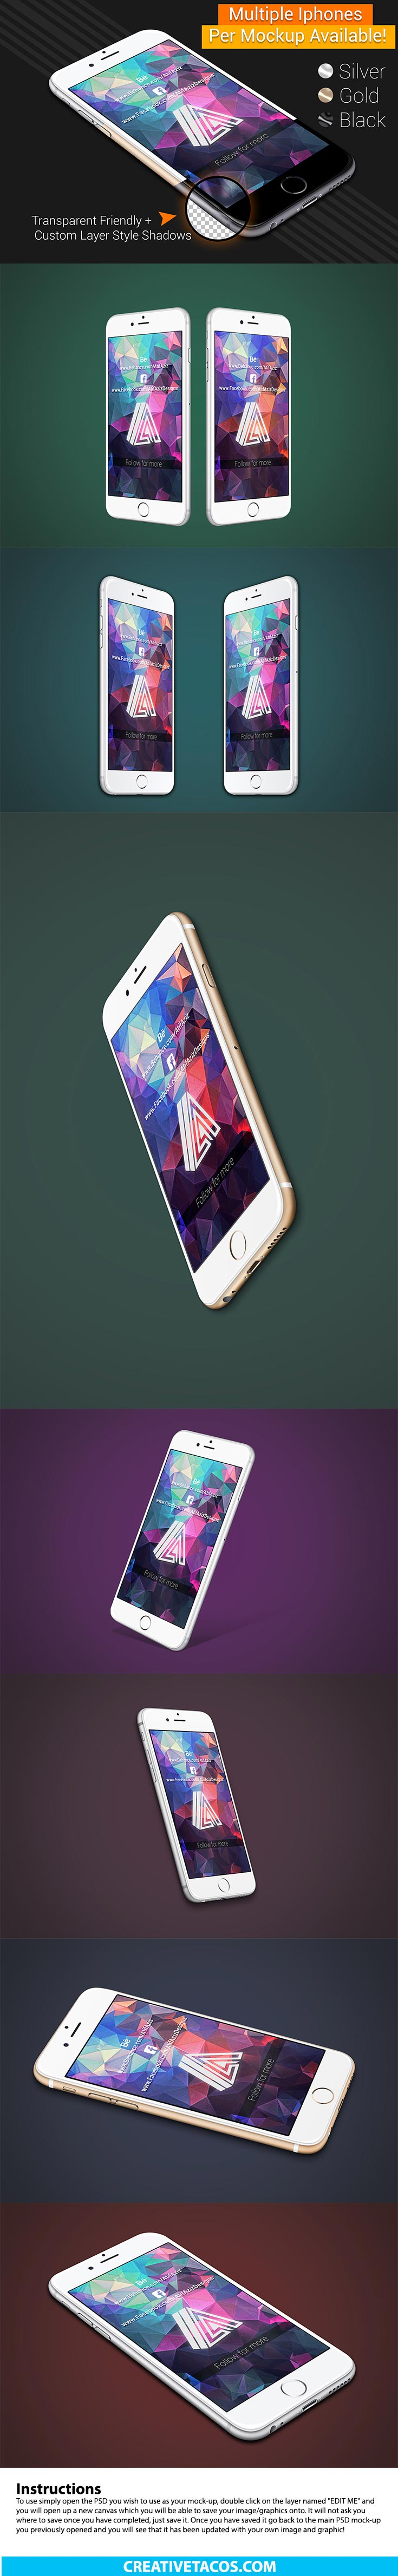 7 Free iPhone PSD MOCKUP